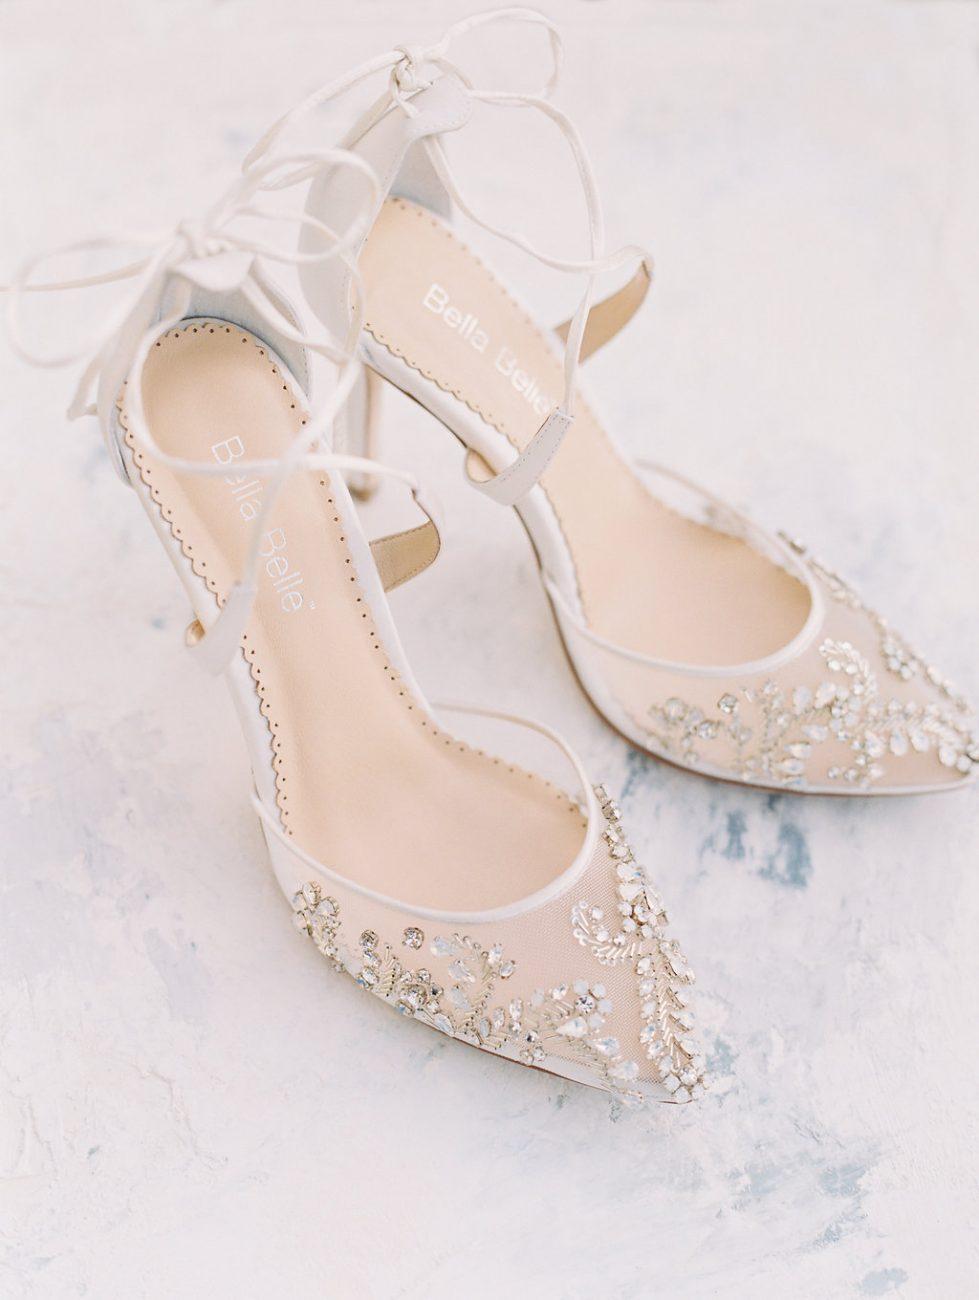 Orange Country wedding inspiration shoes